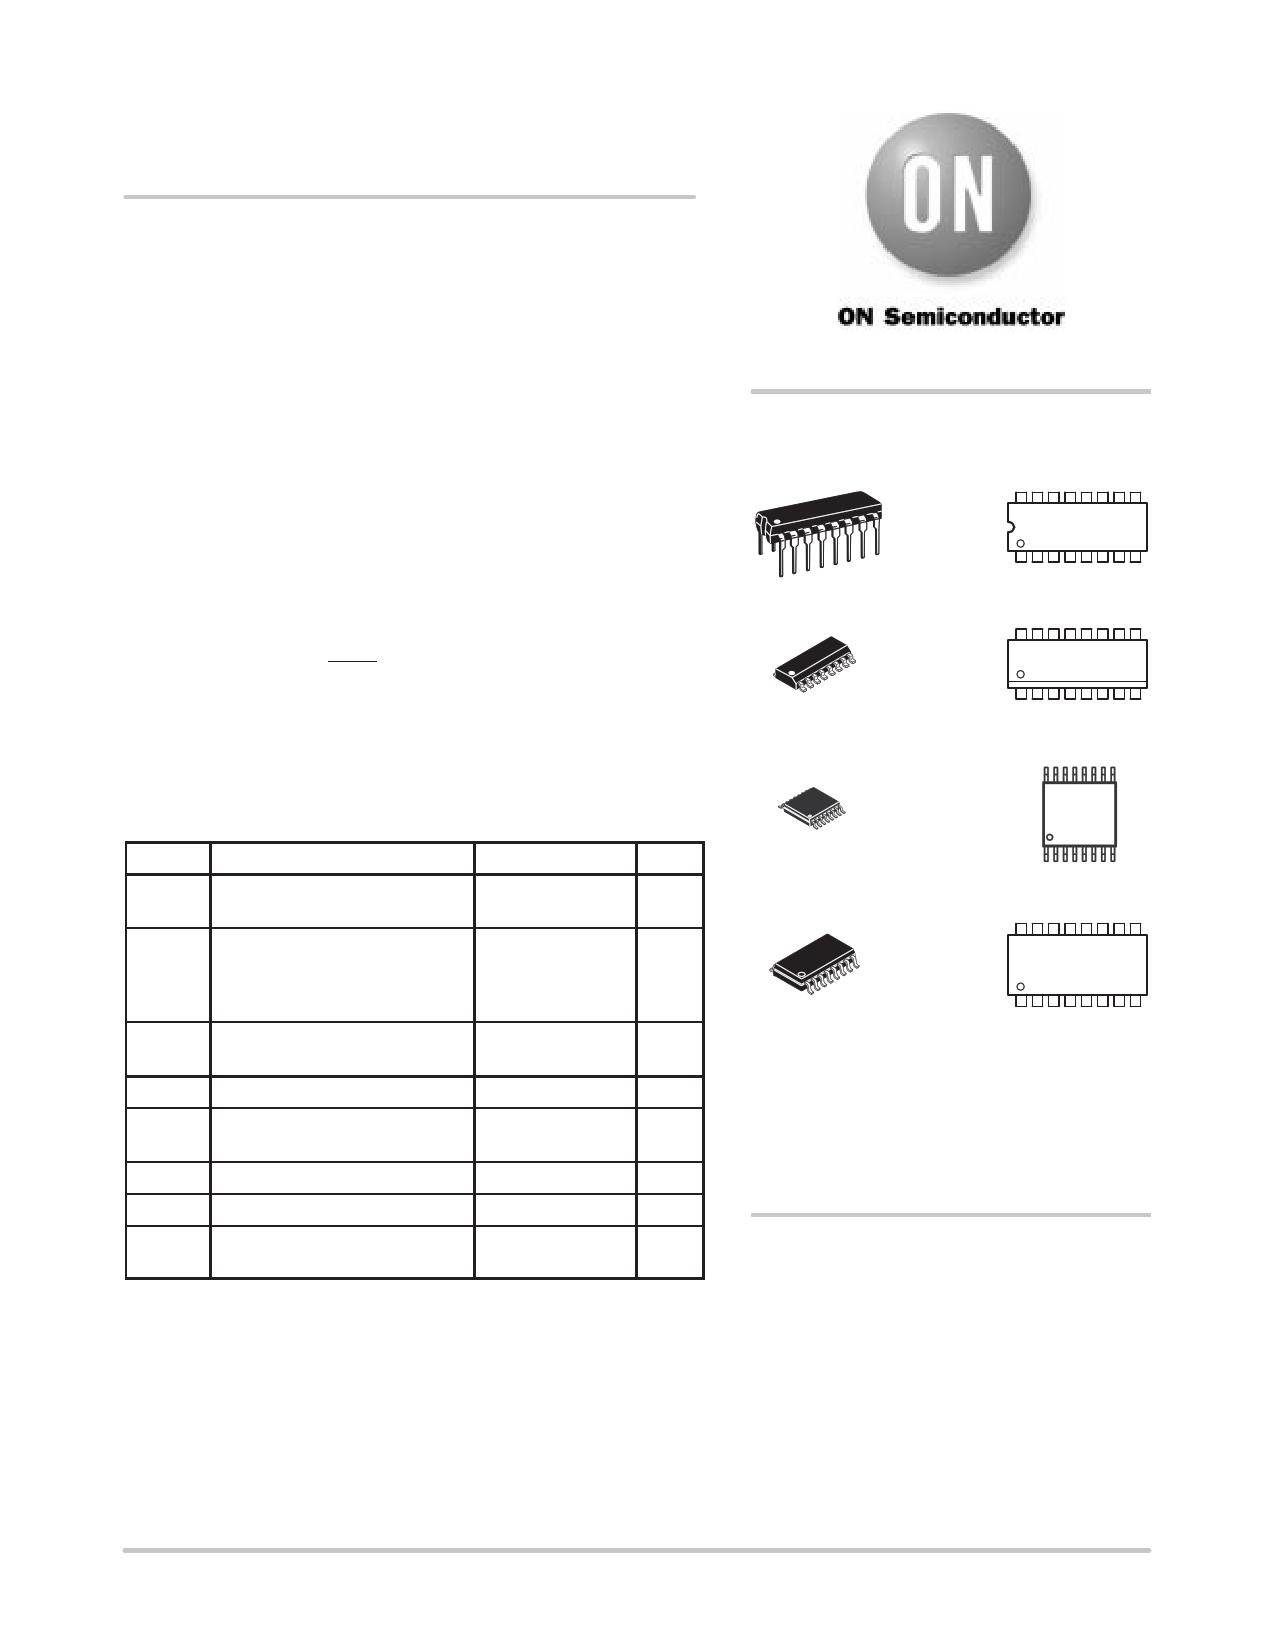 Multiplexers Pdf Giftsforsubs Block Diagram For Ttl Ic Multiplexer 74hc153 Tikz Example Mc14053